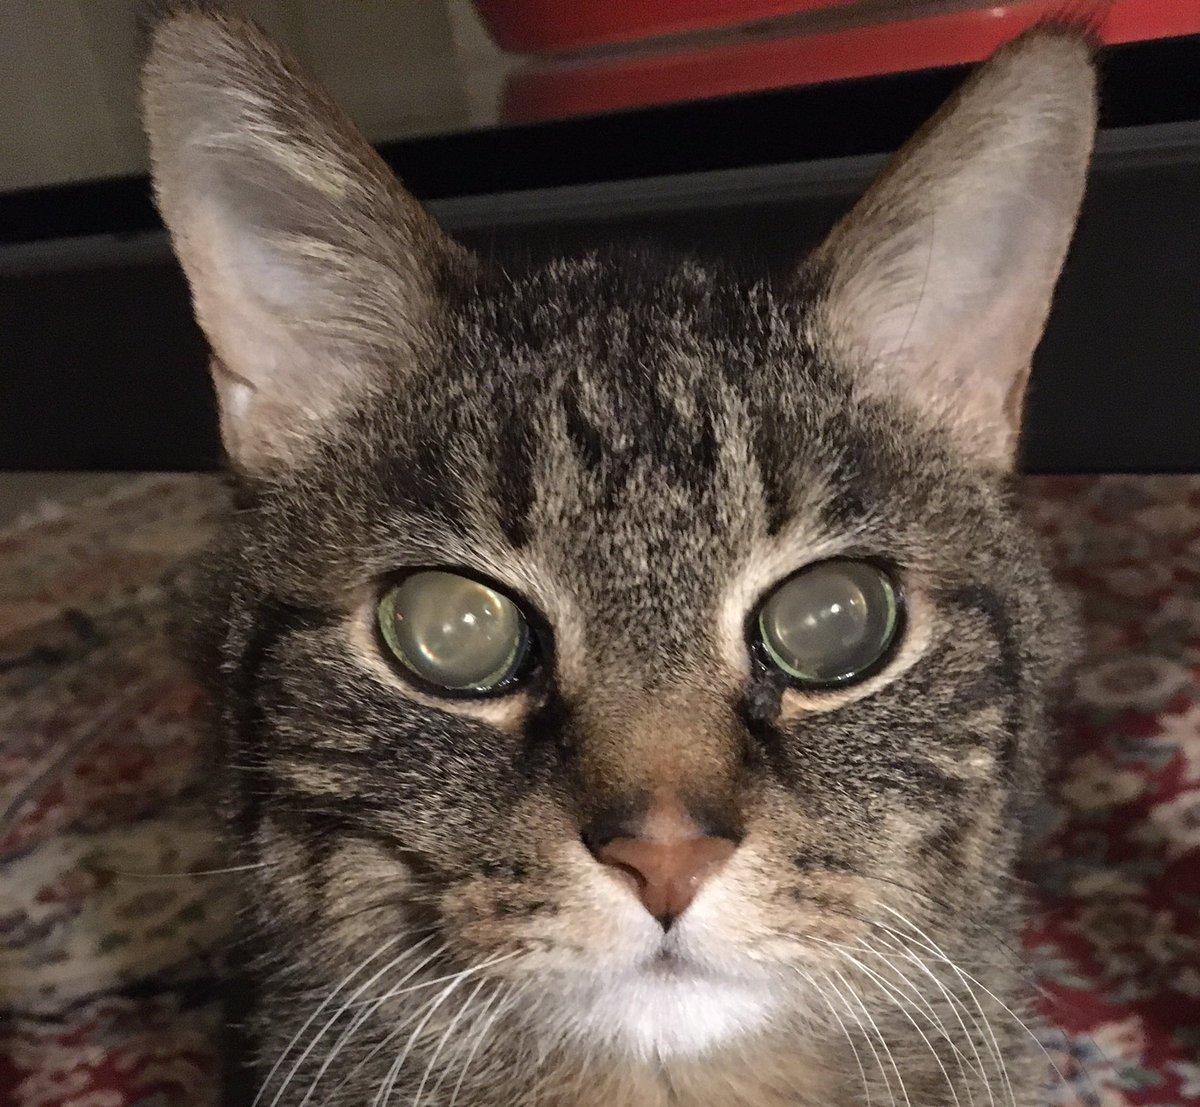 Stanley is watching you Kellyanne.  #catsjudgingkellyanne